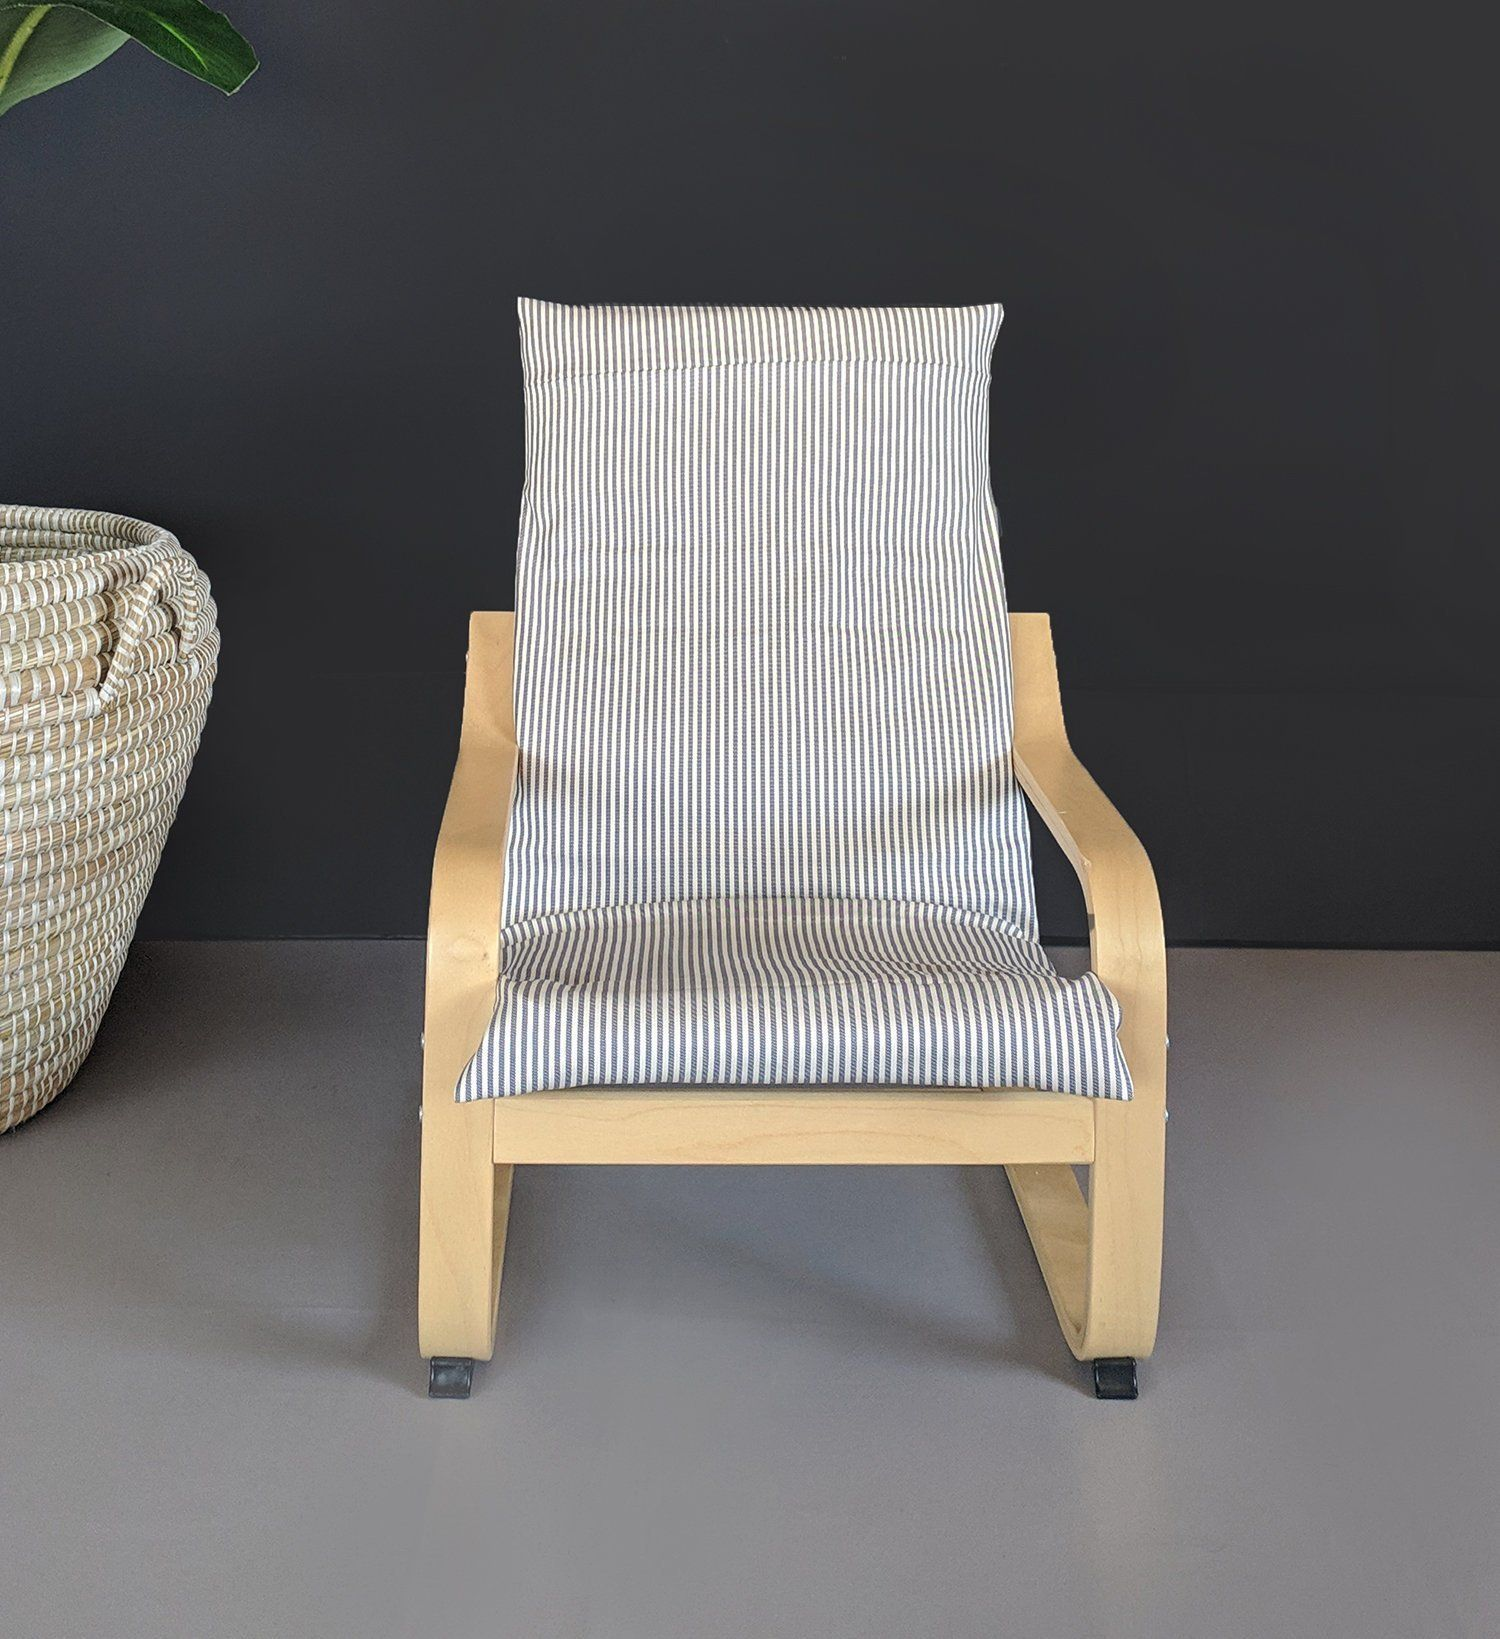 Custom Outdoor Furniture Covers Uk